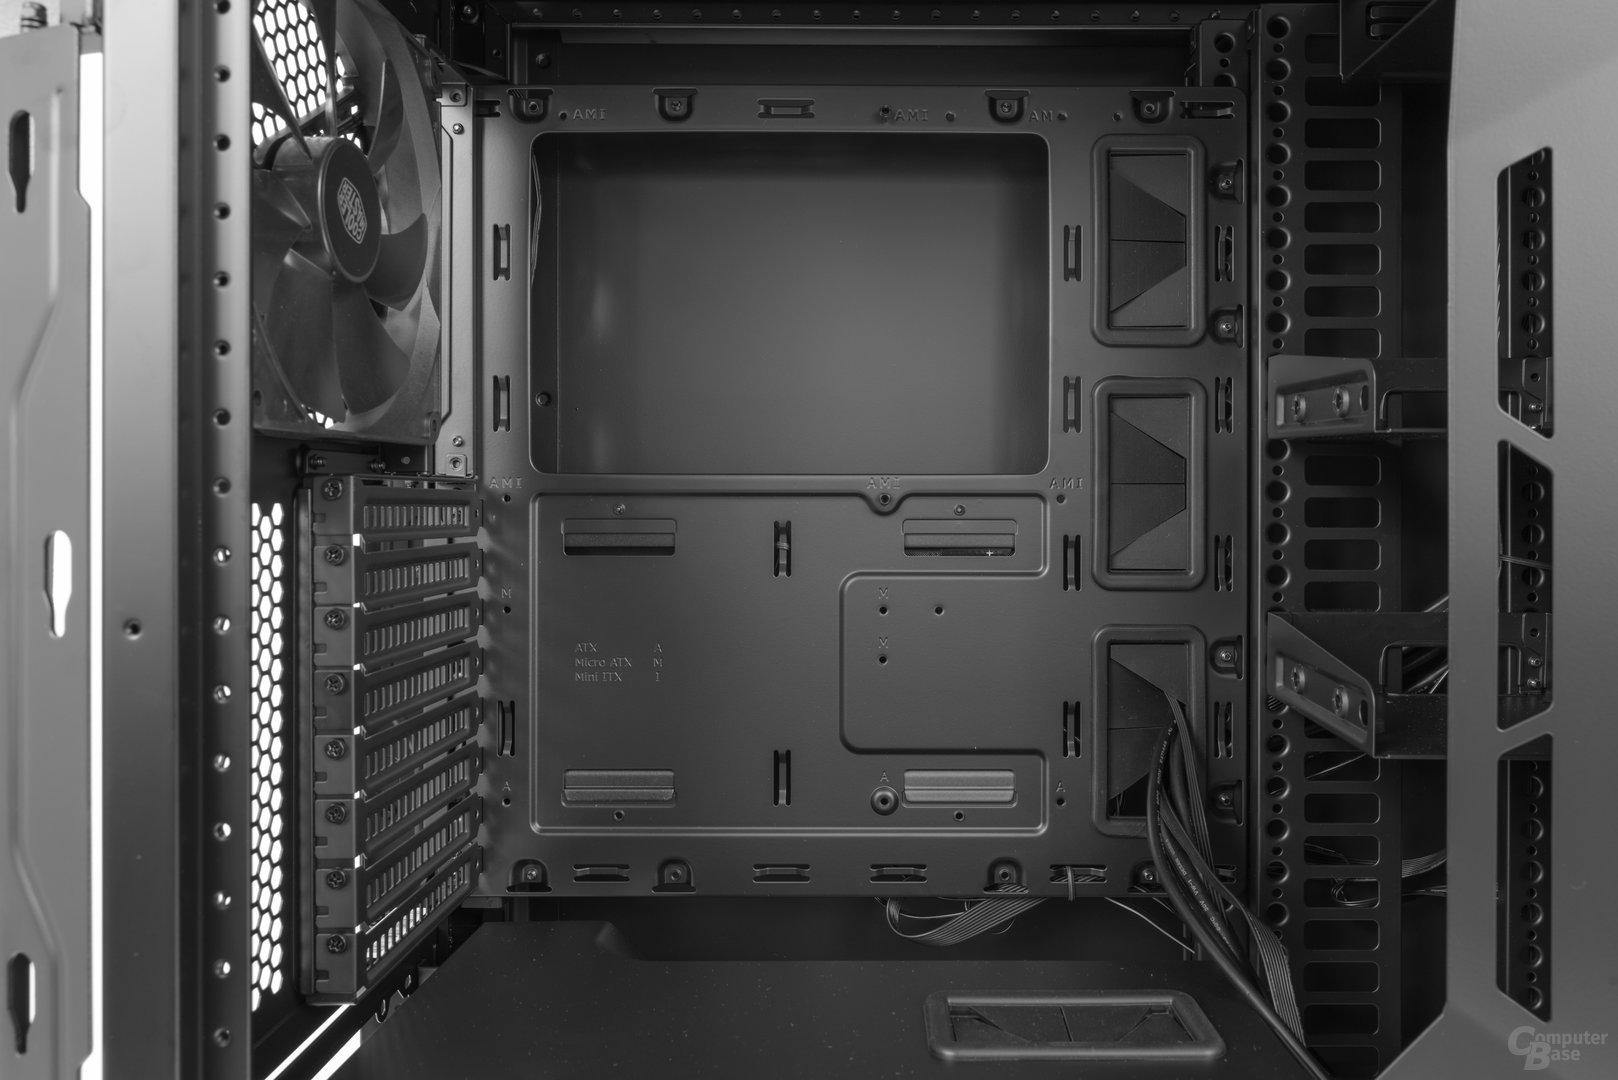 Cooler Master Cosmos C700P – Der Mainboardtray im Detail